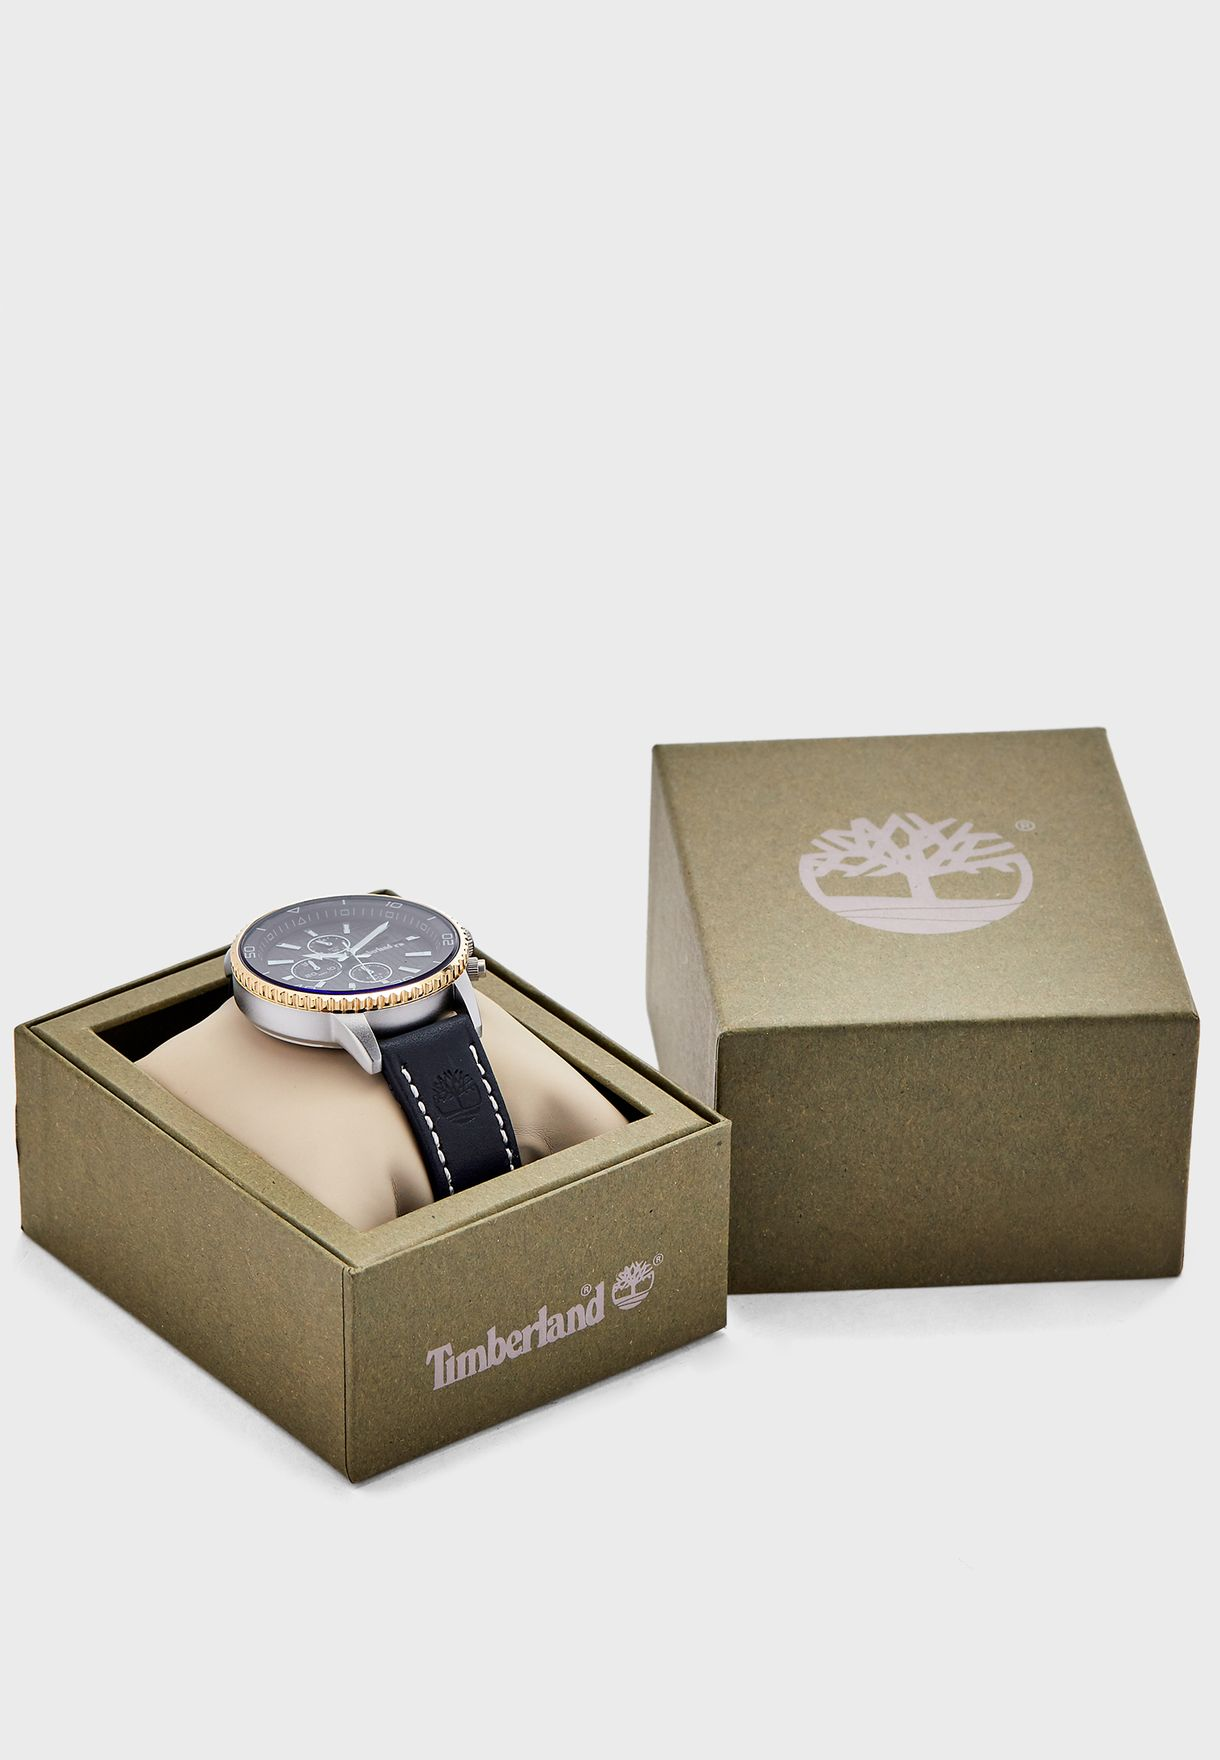 Woodworth Watch